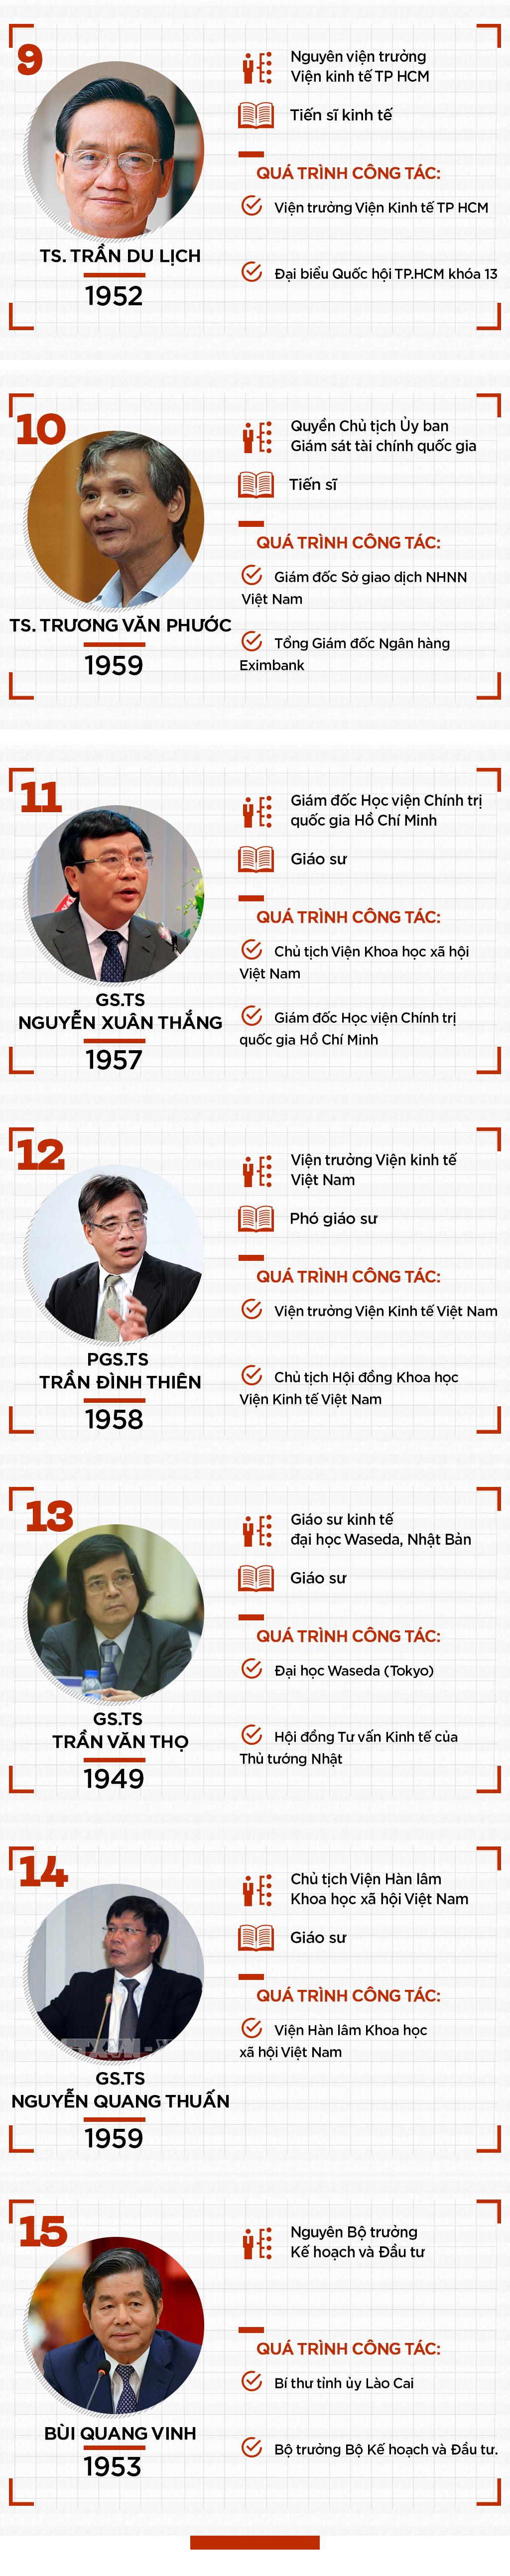 project chi GiangArtboard 2